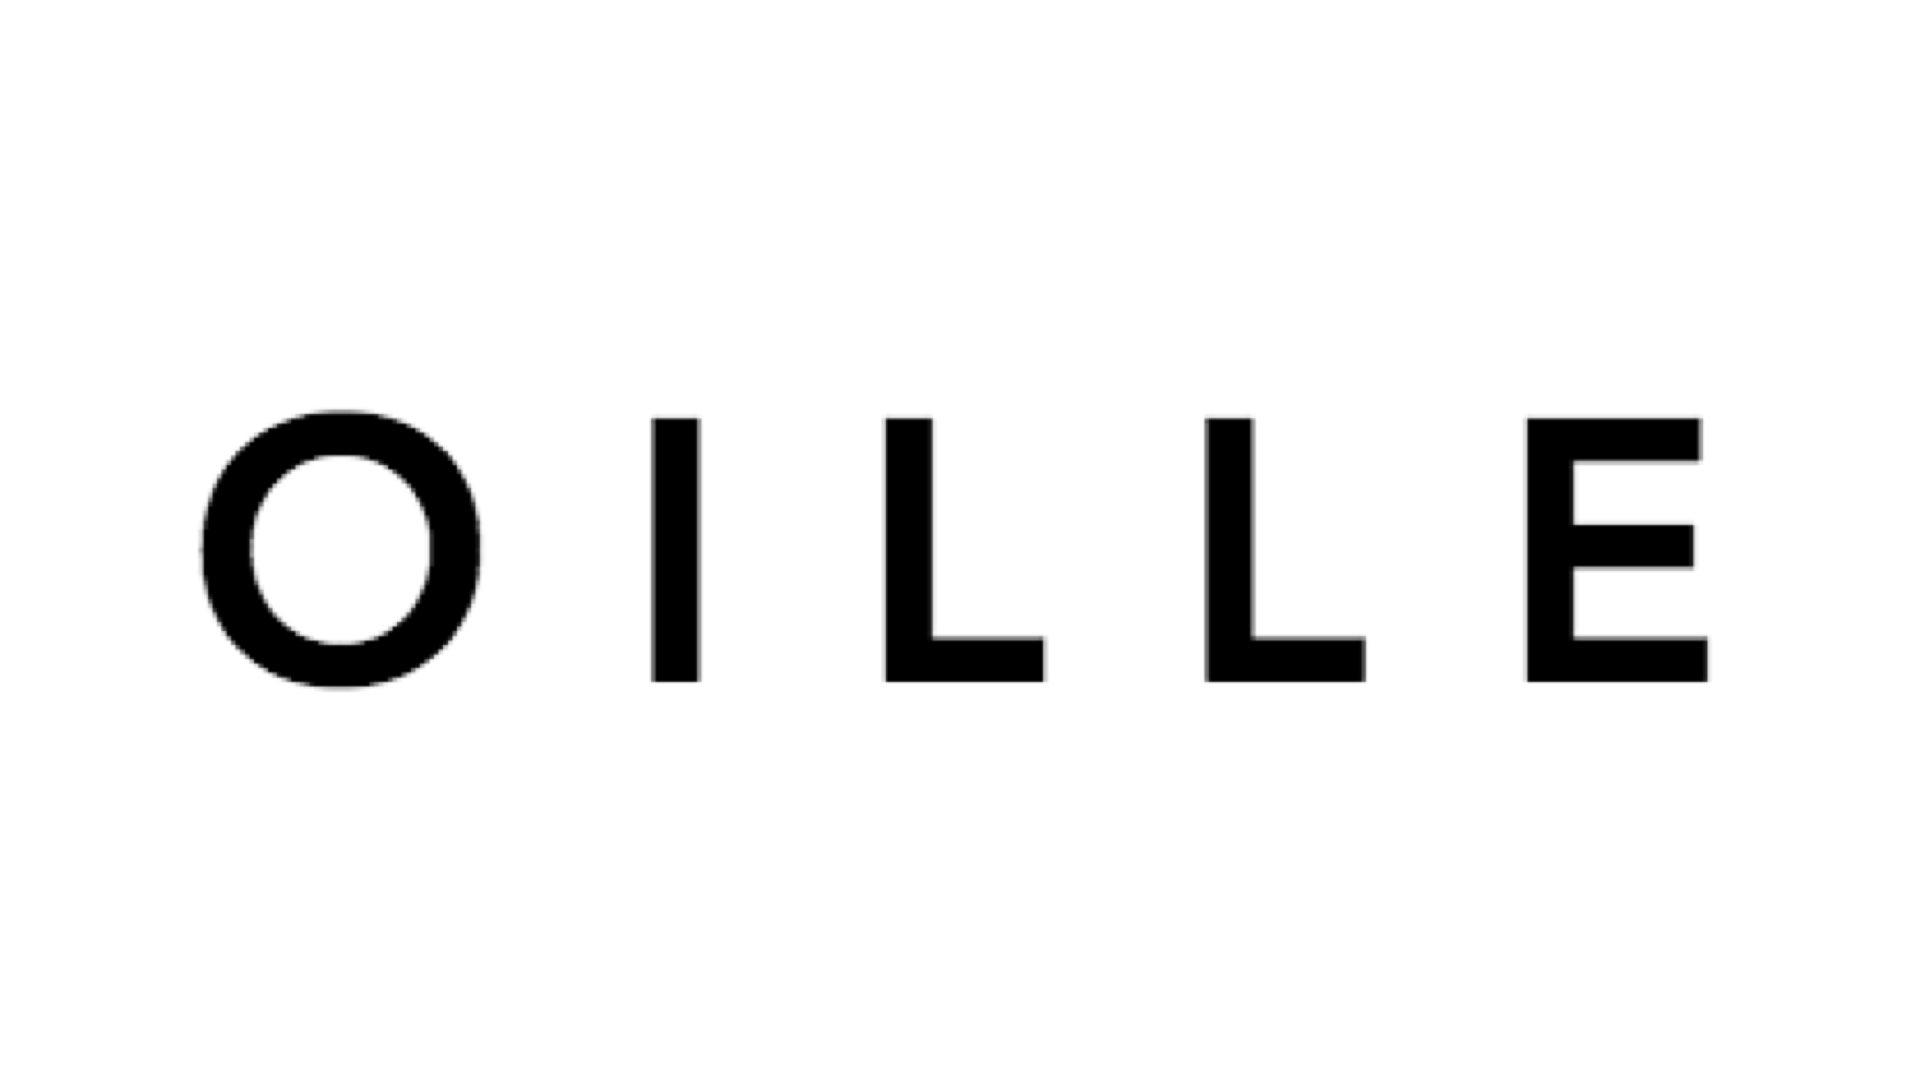 CDS 2017 logos.071.jpeg